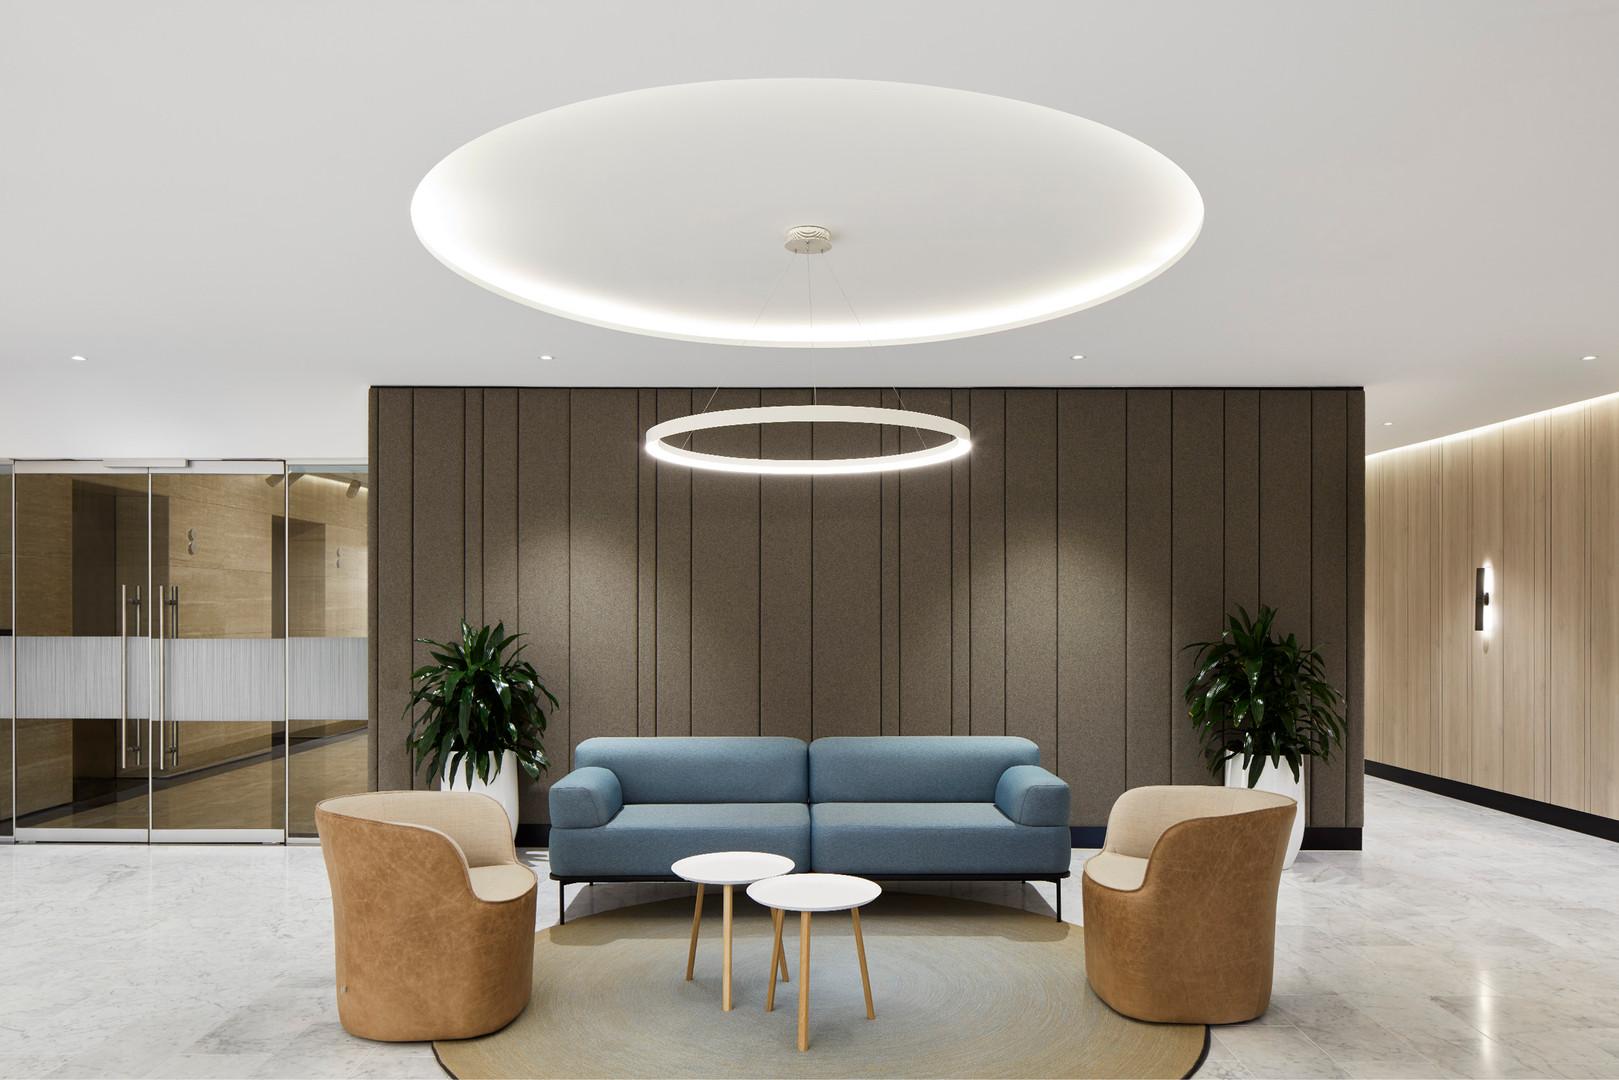 Corporate-Office-Interiors-31428.jpg